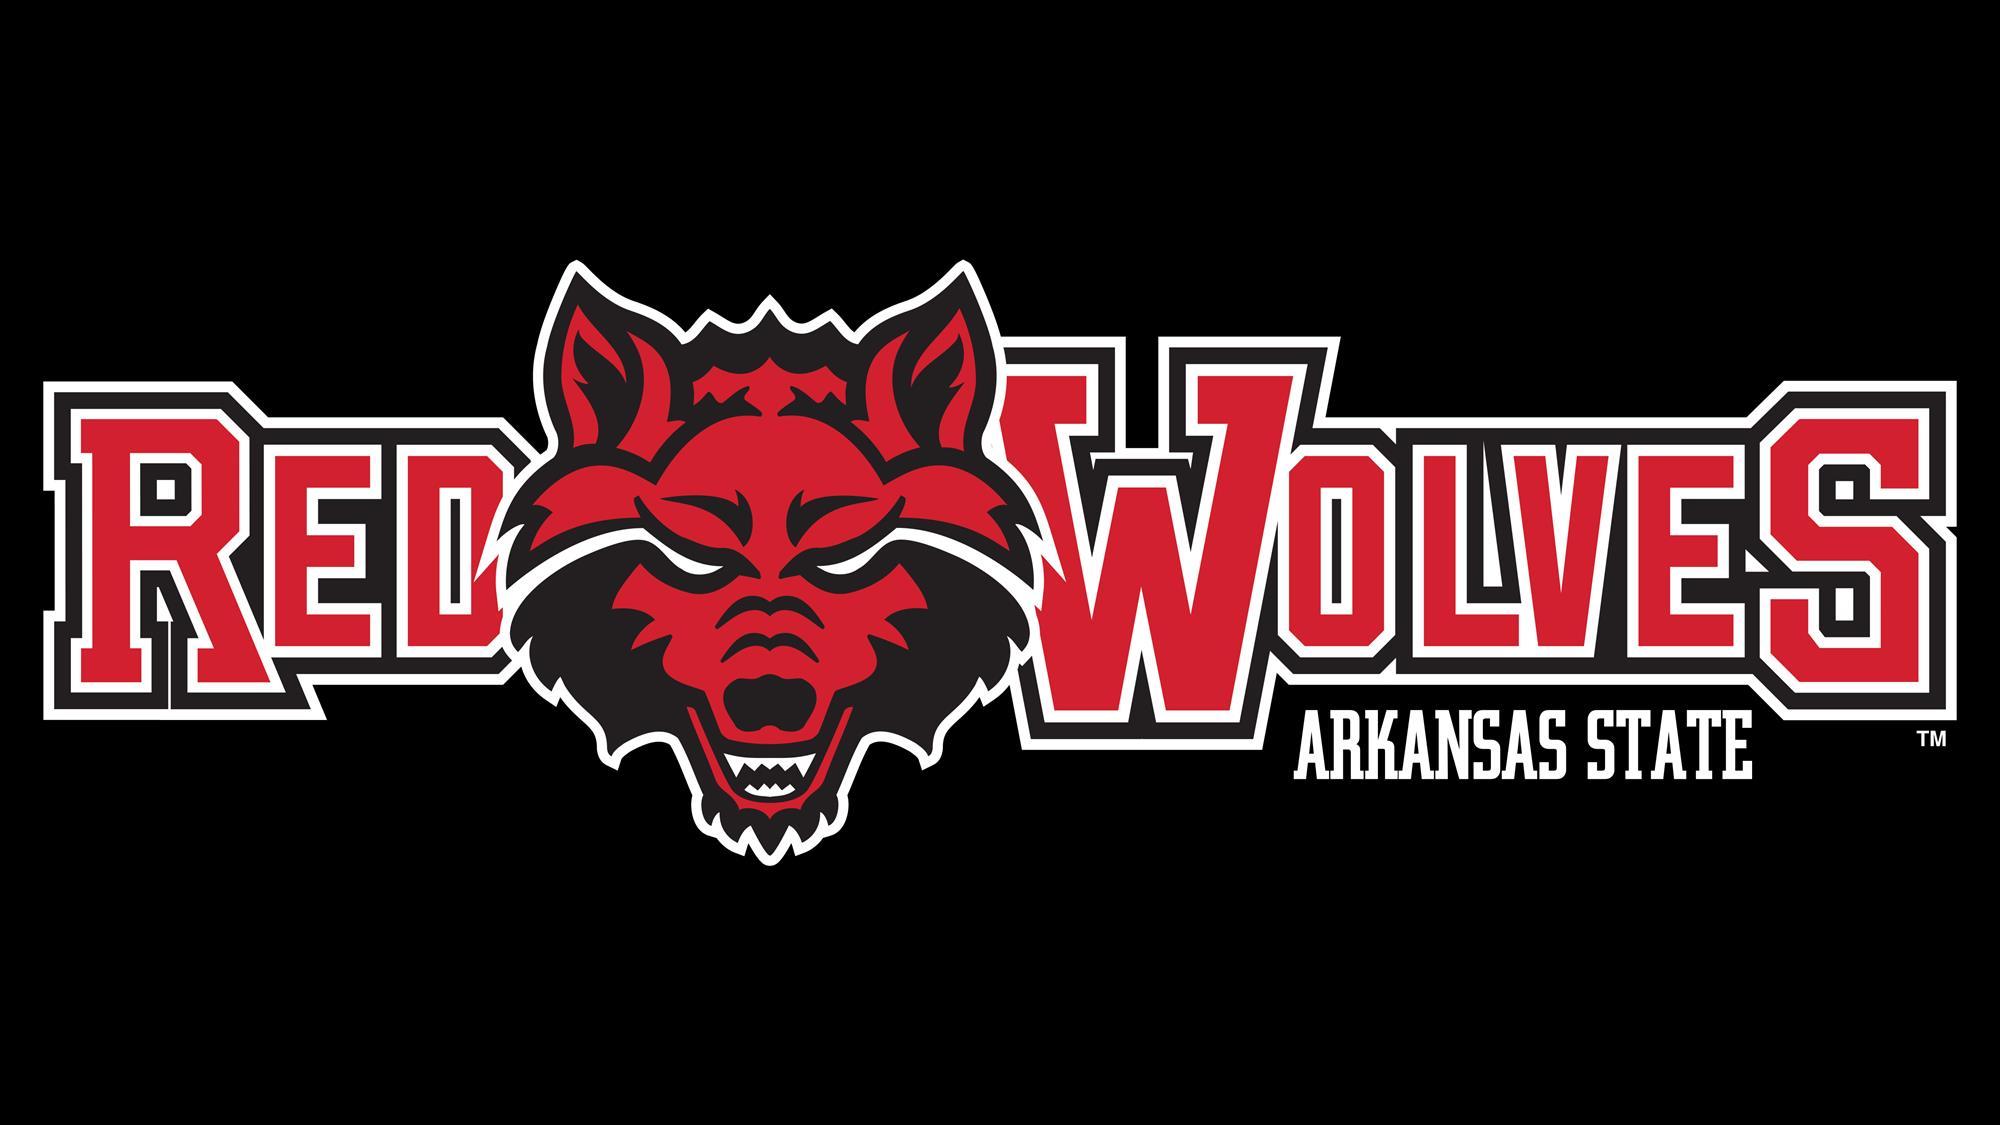 Athletics – Arkansas State University Intended For Arkansas State University Holiday Schedule